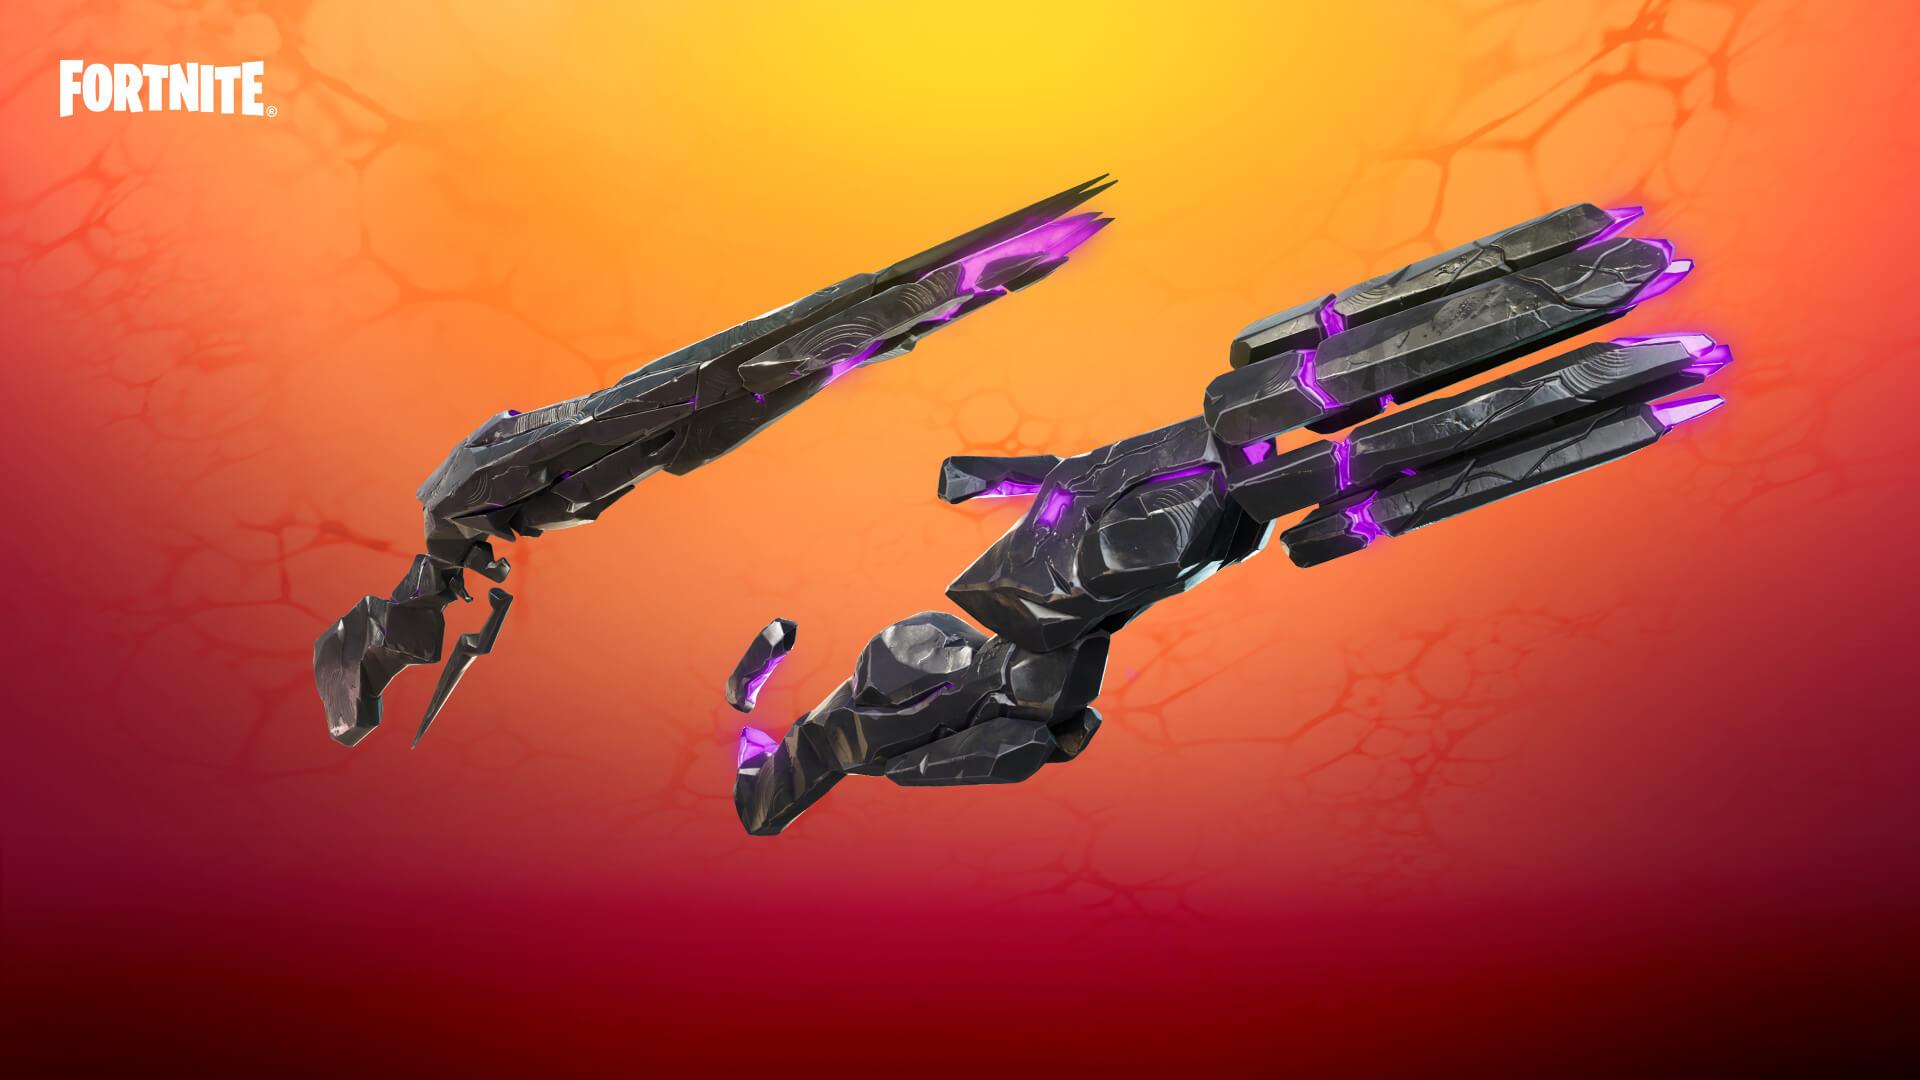 Fortnite Sideways Weapons